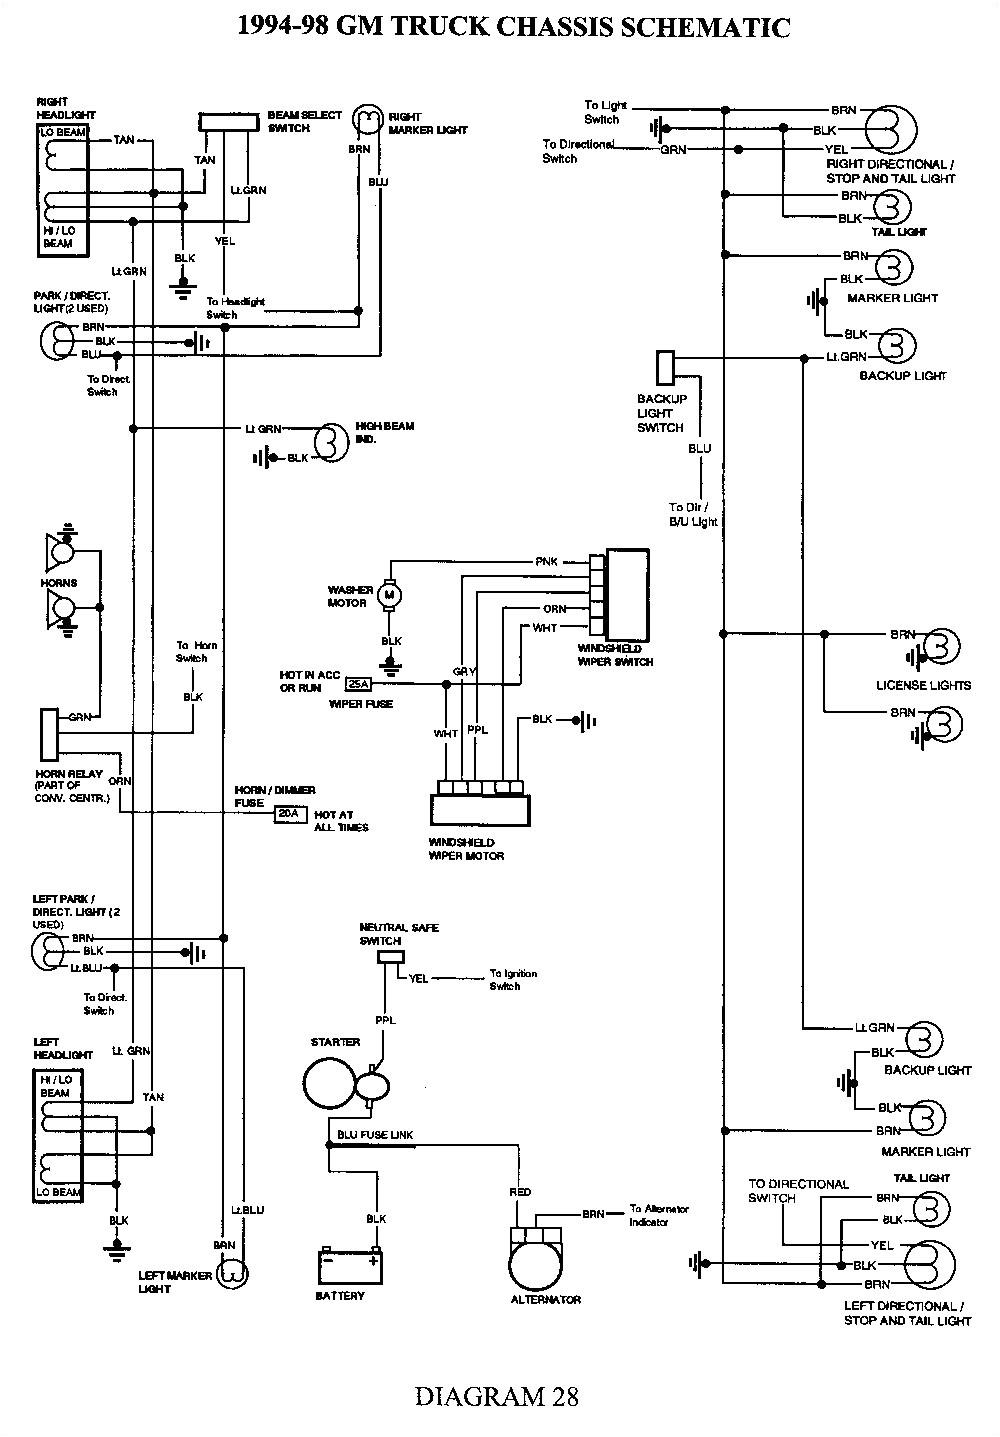 2002 chevy silverado trailer wiring diagram wiring diagrams recent 2002 silverado trailer wiring colors 2002 gmc trailer wiring